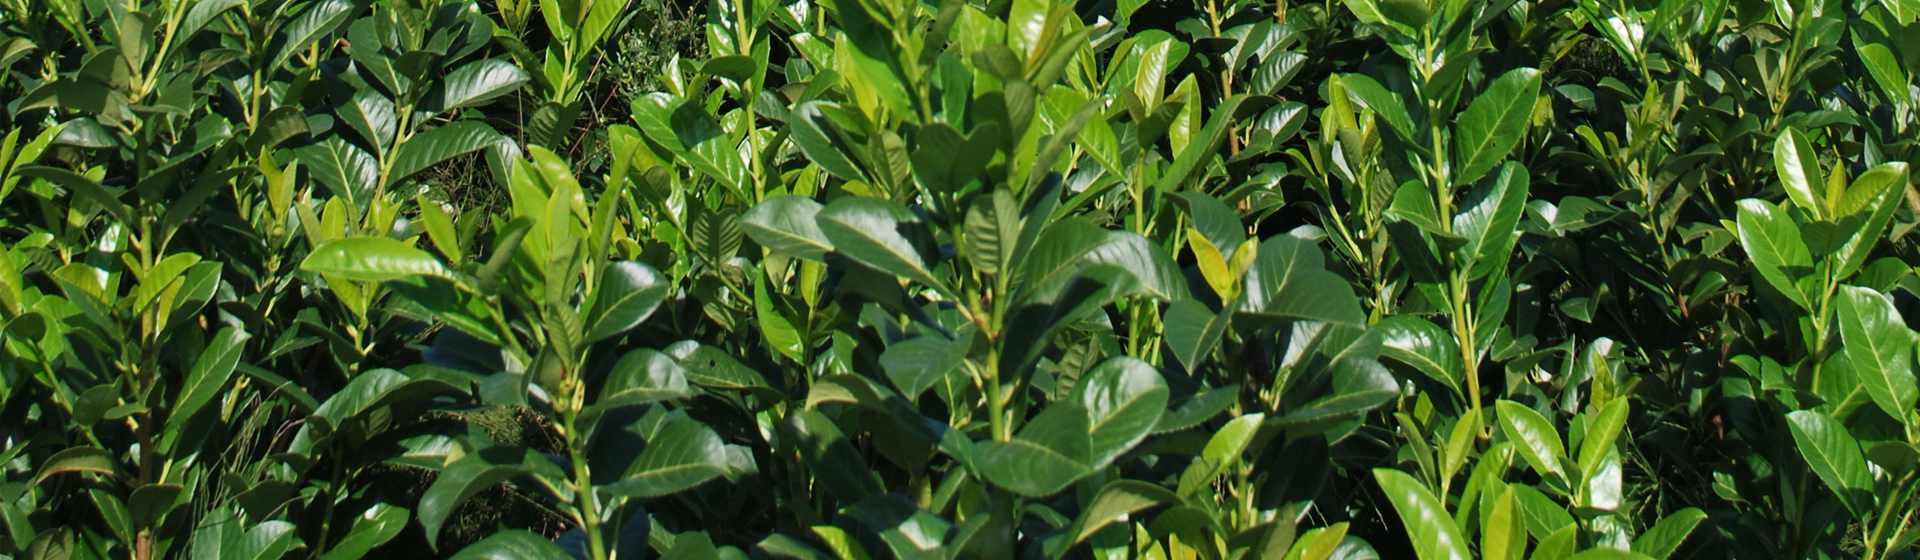 Vendita Piante Da Siepe : Lauro prunus laurocerasus vendita piante da siepe